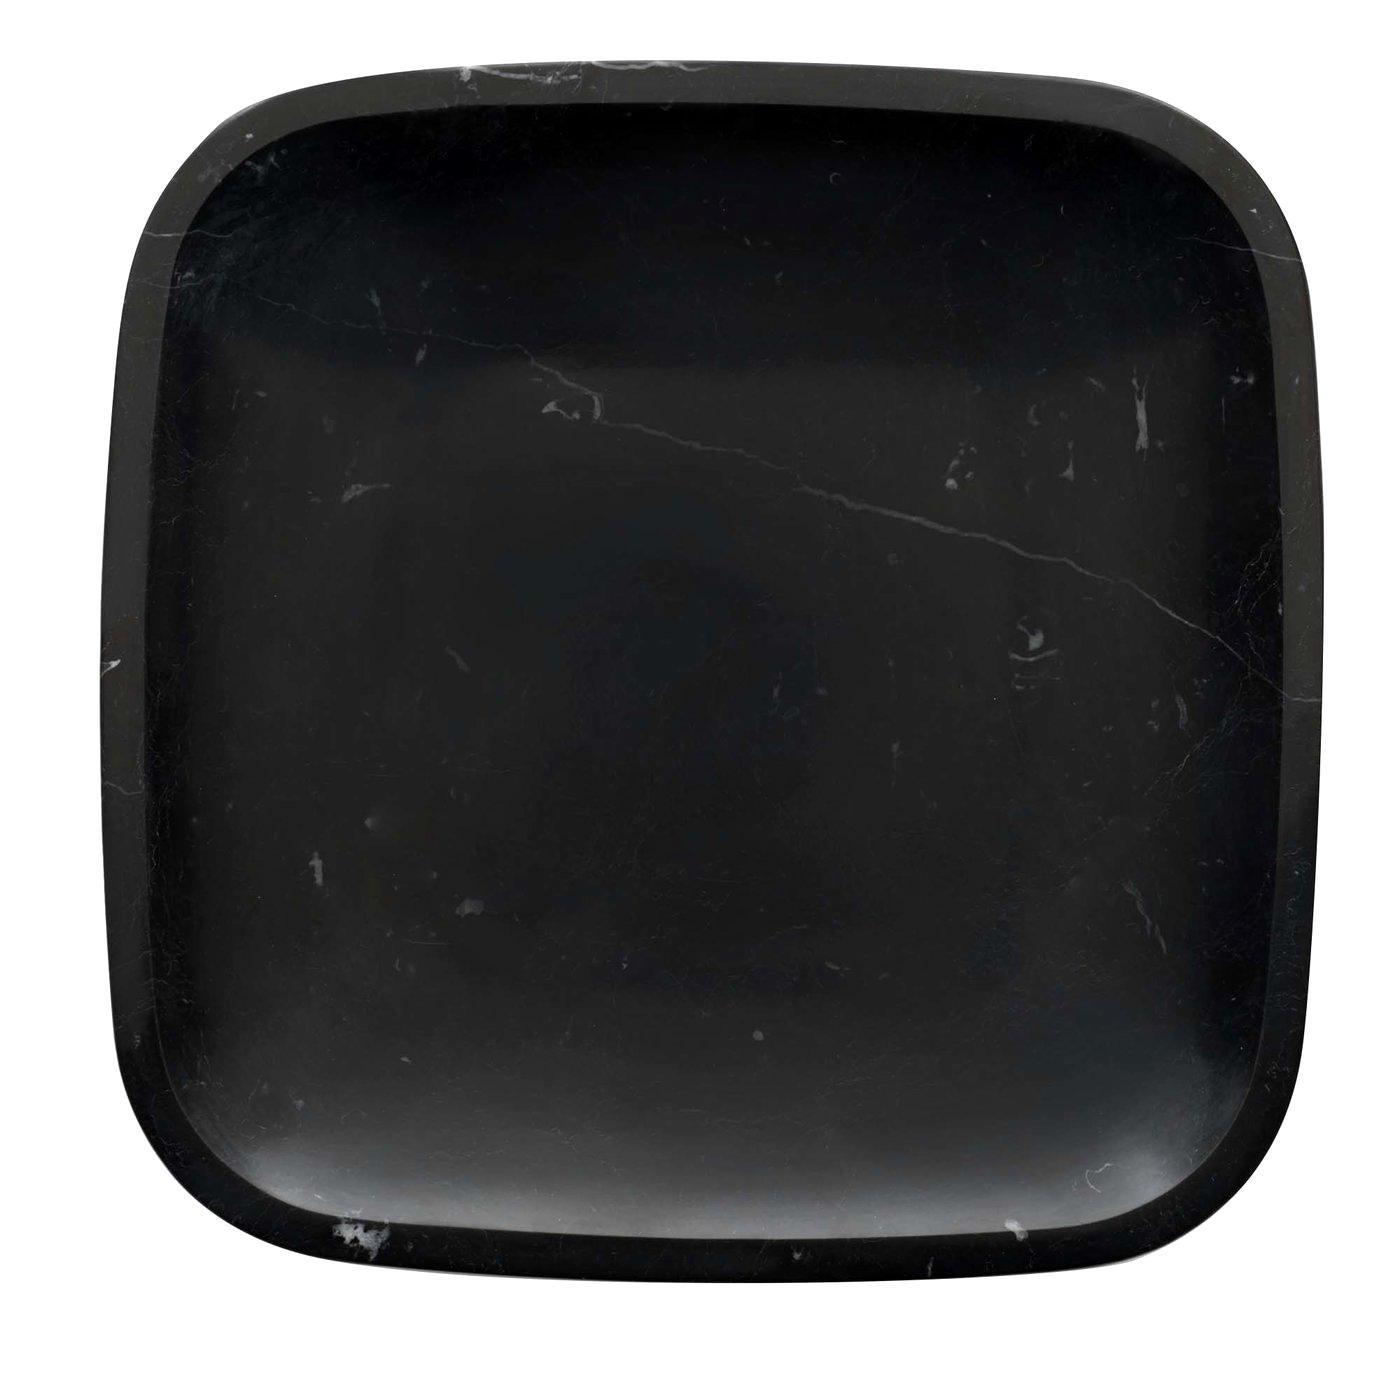 Black Dina Fruit Bowl, Design James, Irvine, 2011